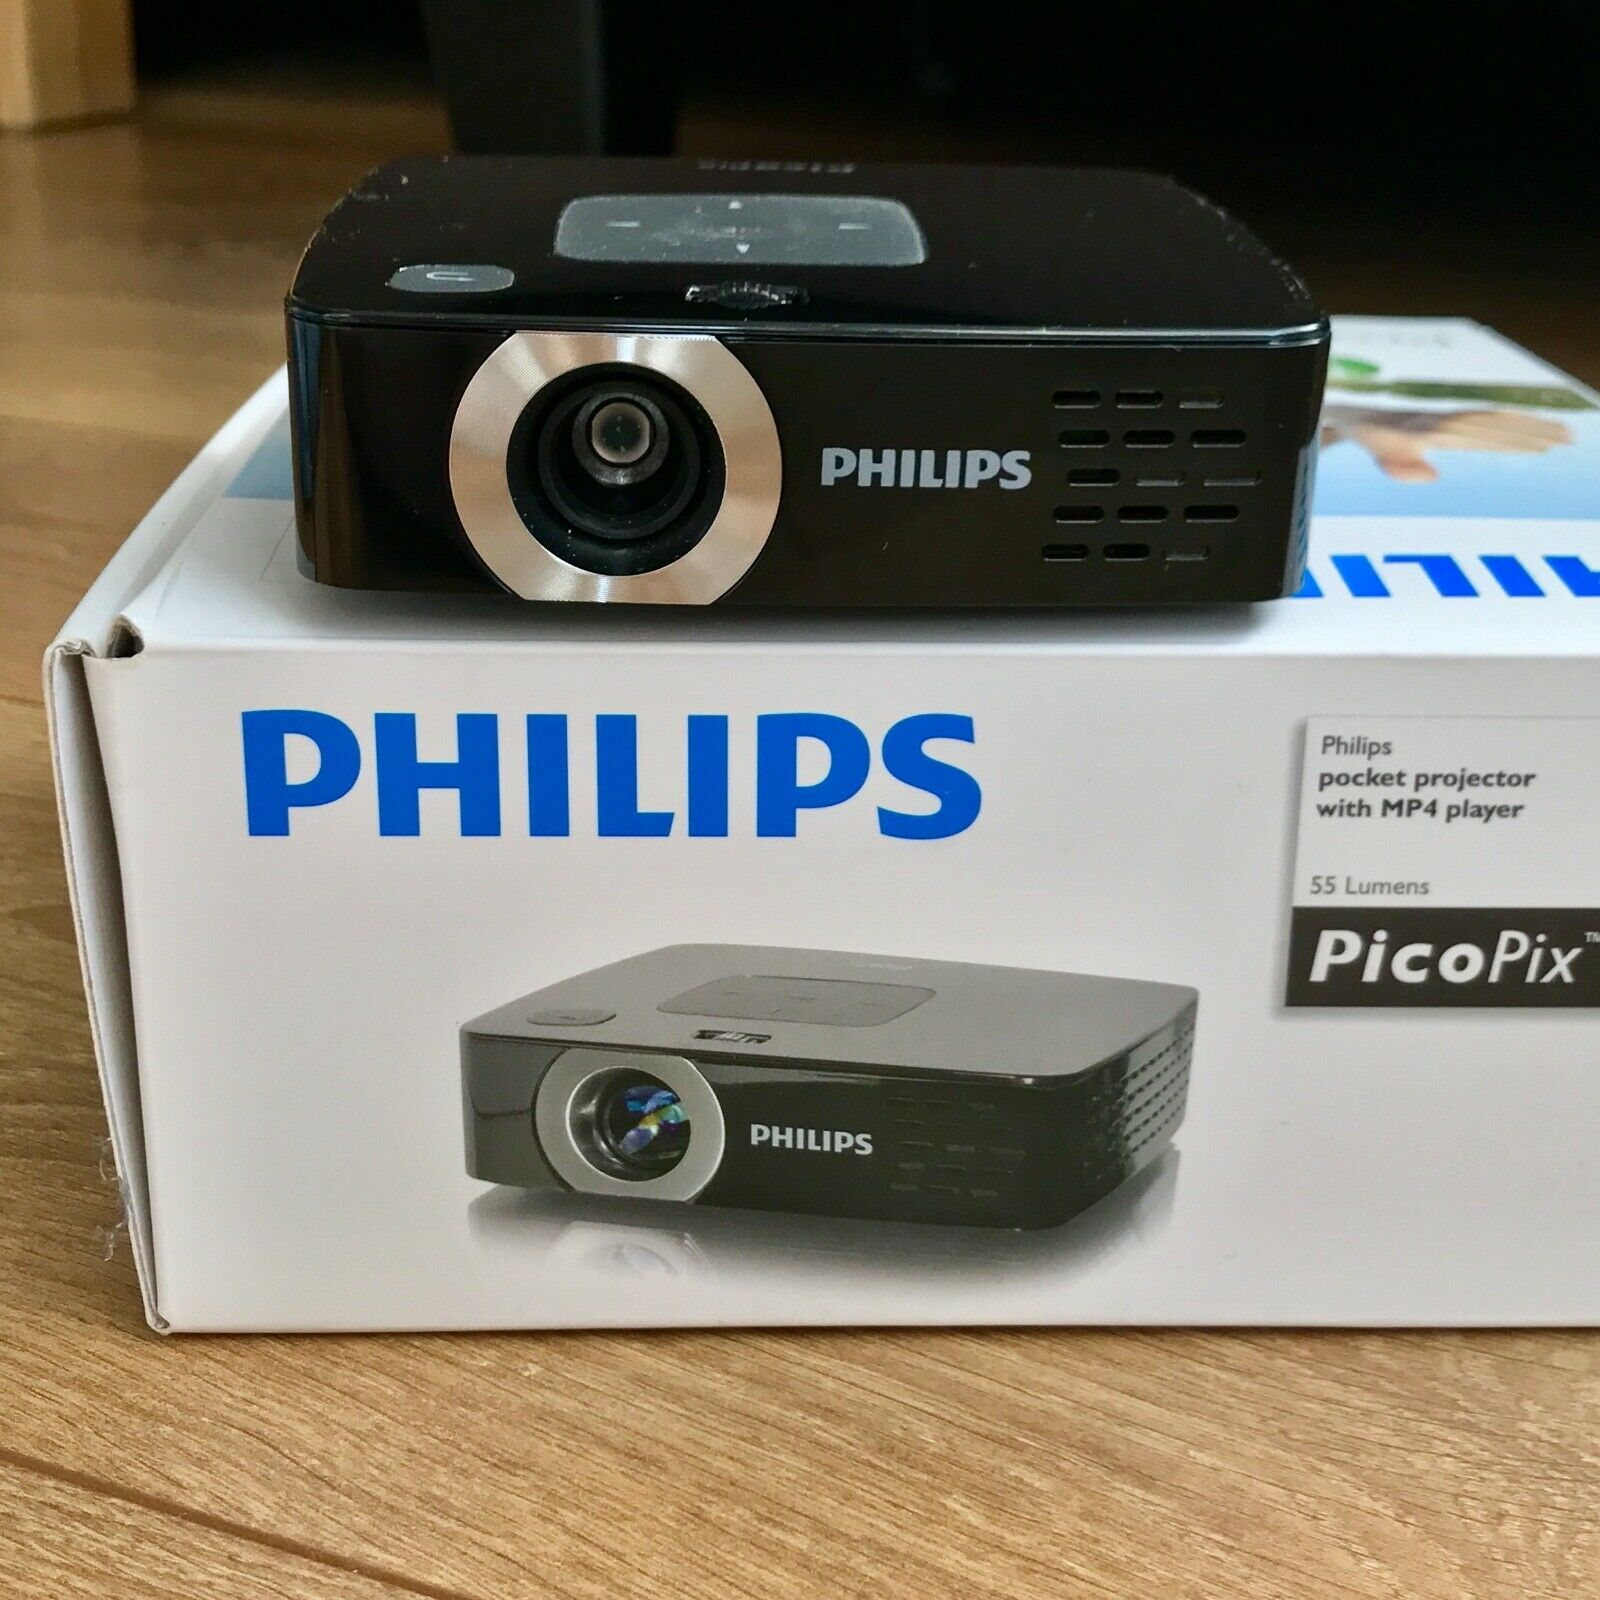 Philips PicoPix 2450 - portabler DLP Taschenprojektor